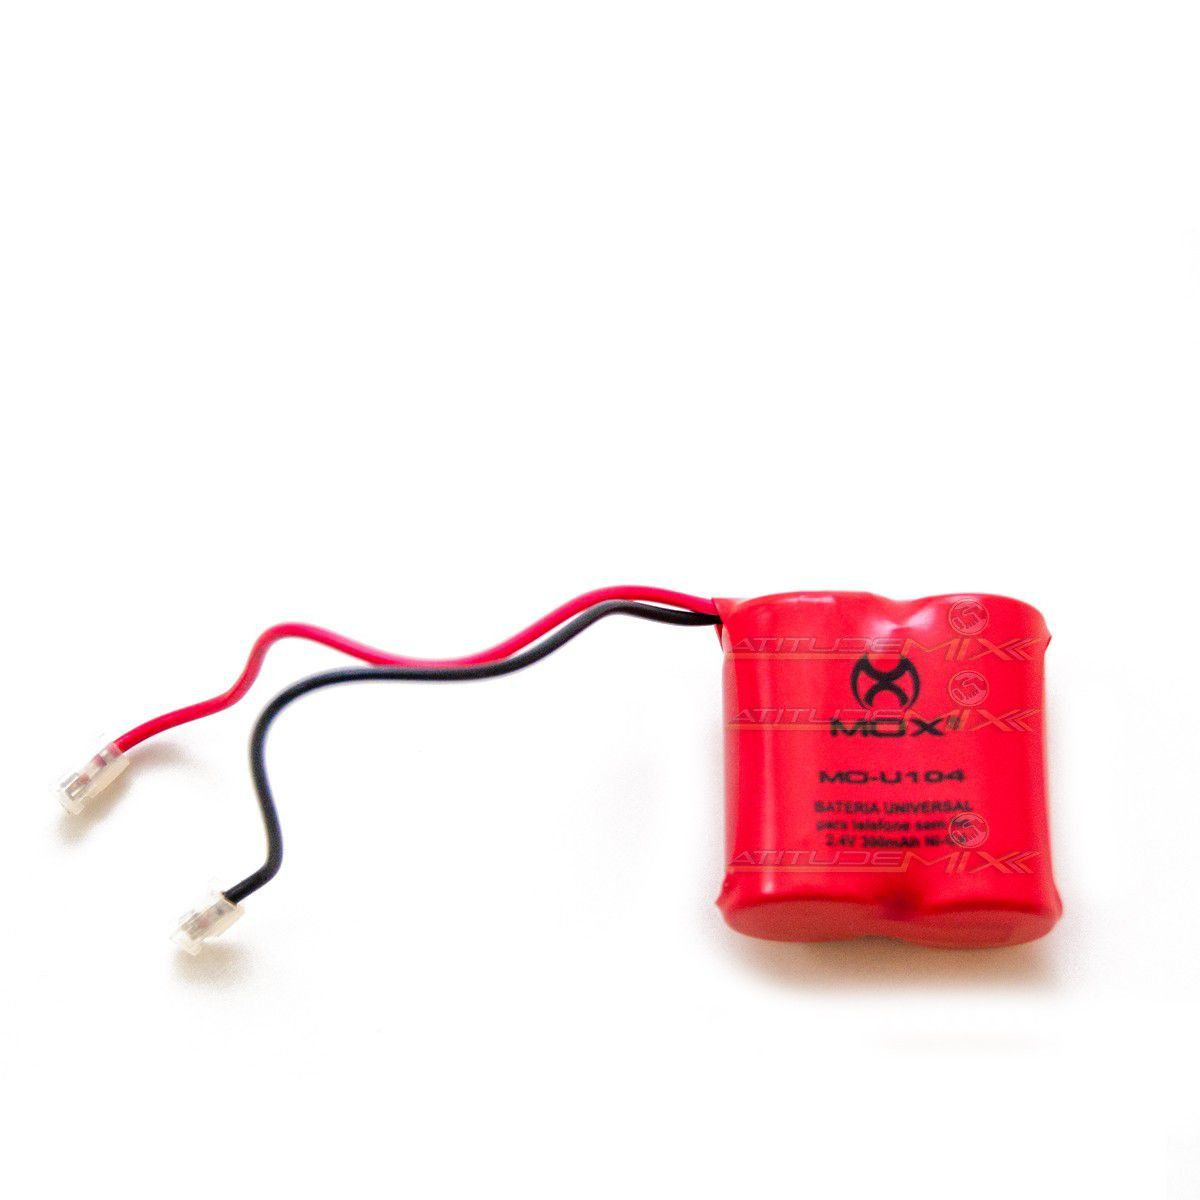 Bateria P/ Telefone S/ Fio MO-U104  - Sarcompy